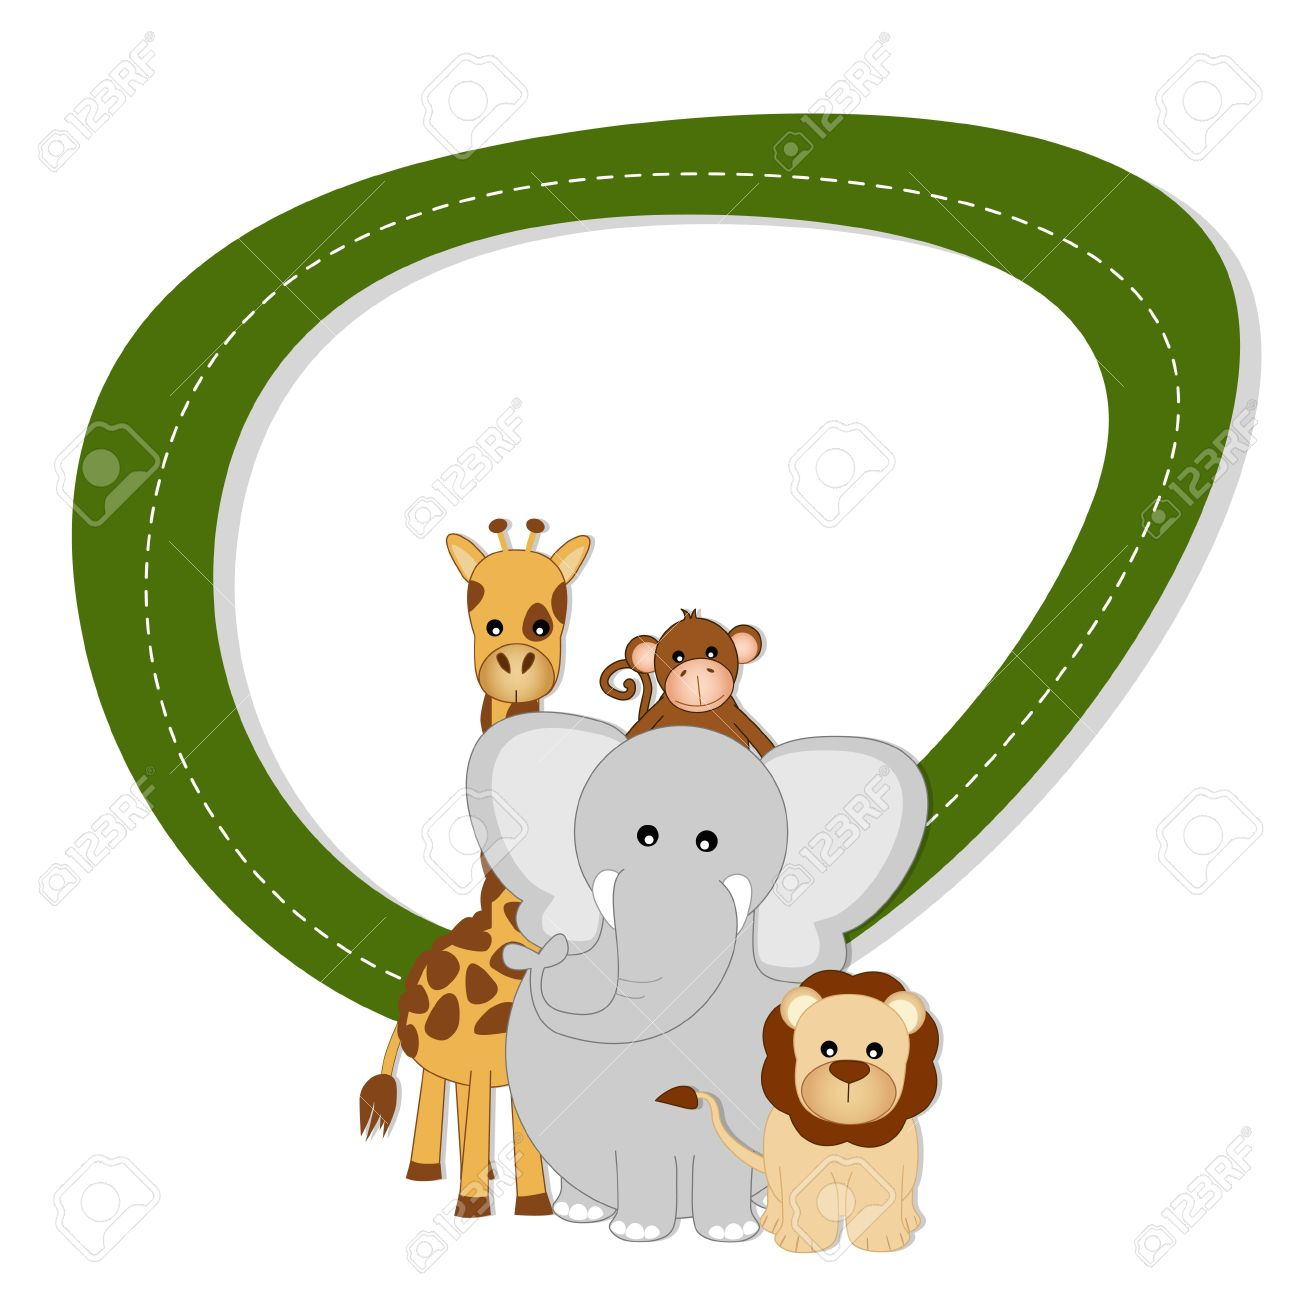 Savannah baby animals - lion, giraffe, elephant and monkey Stock Vector - 20982475